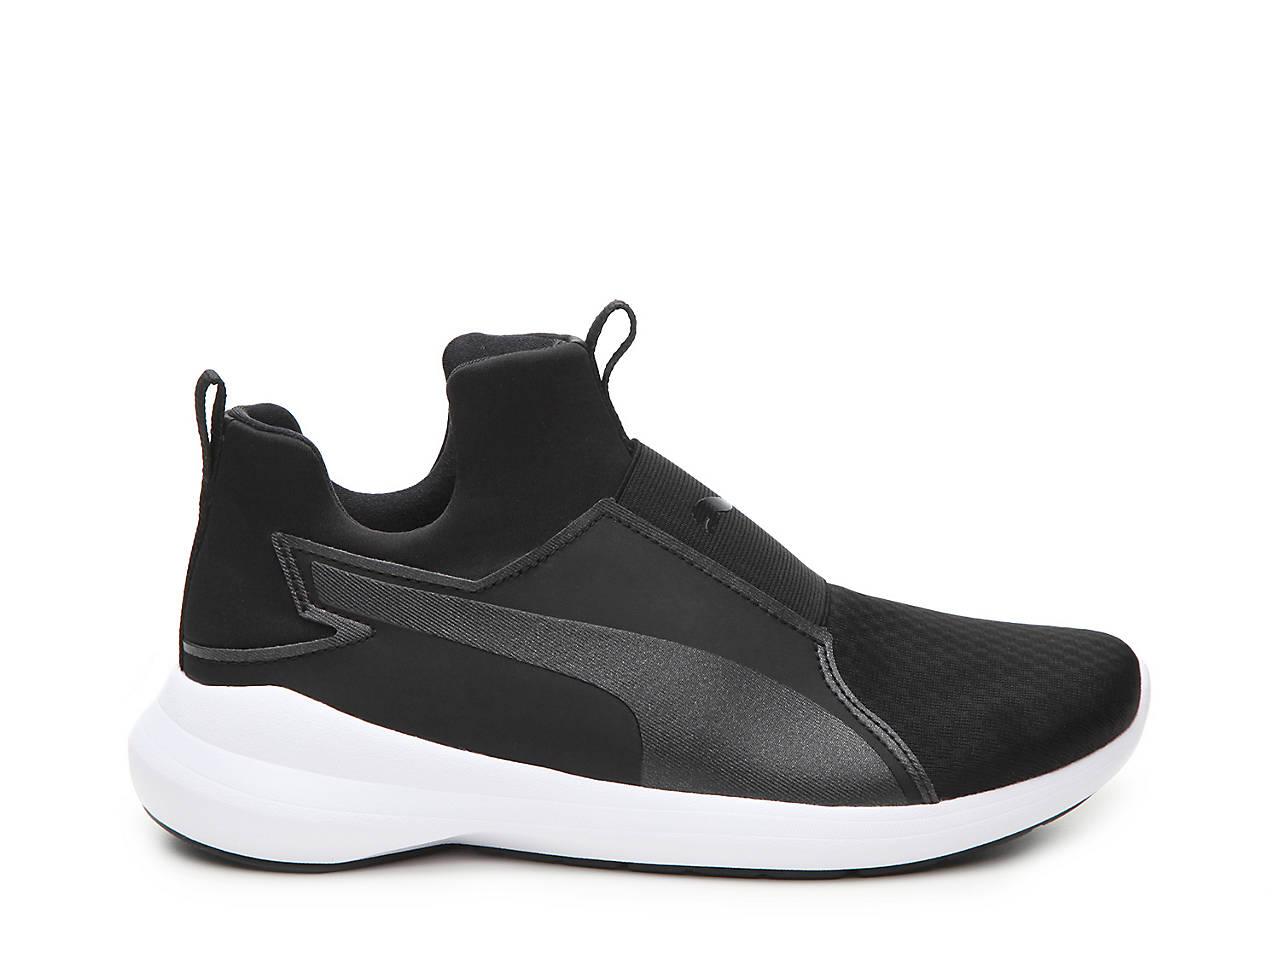 37f31c96ecf85a Puma Rebel Mid Slip-On Training Shoe - Women s Women s Shoes